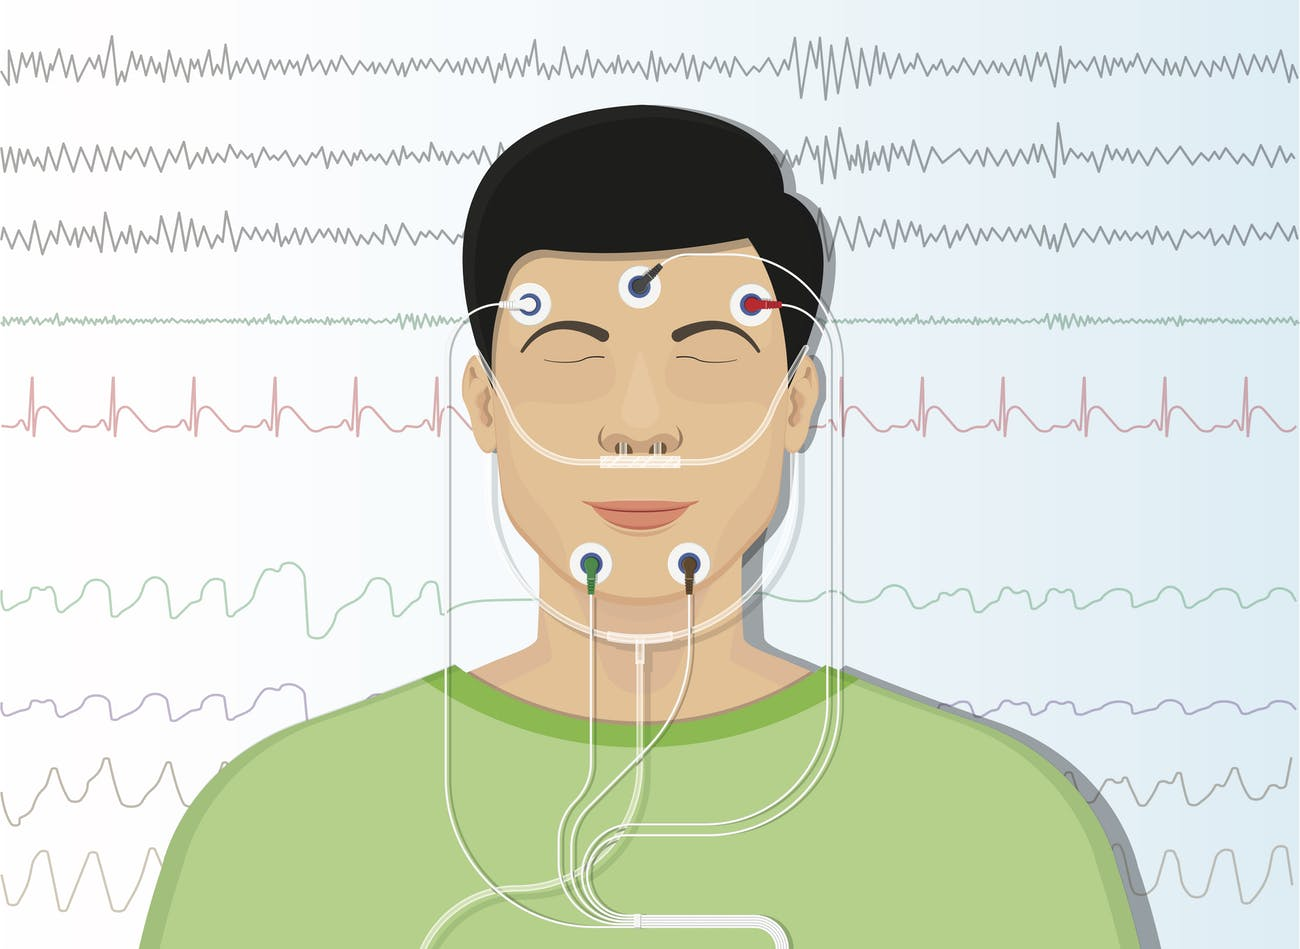 electrodes sleep apnea